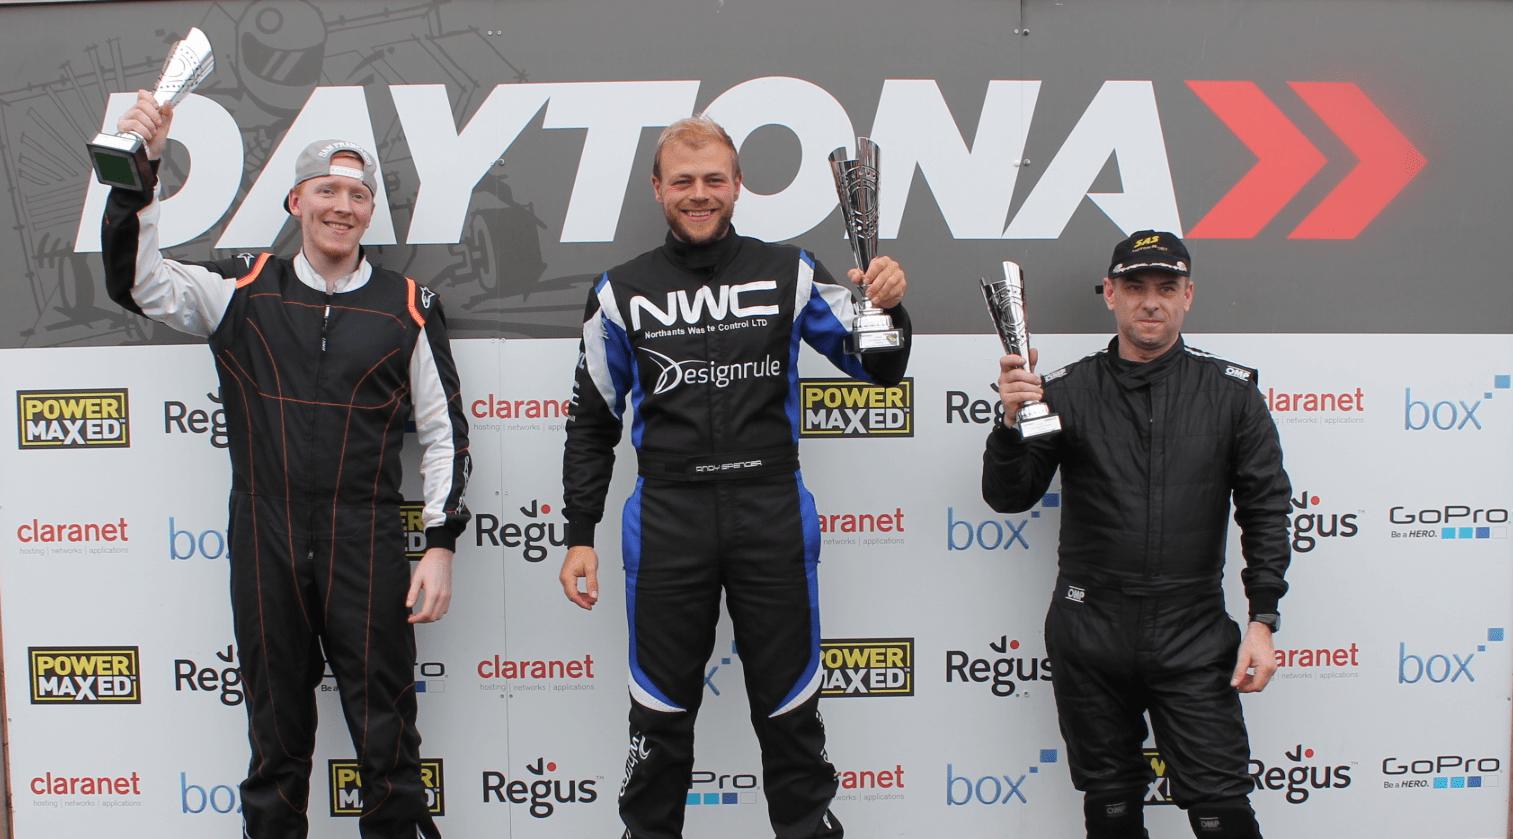 Tamworth Hosts Thrilling Weekend Of Racing